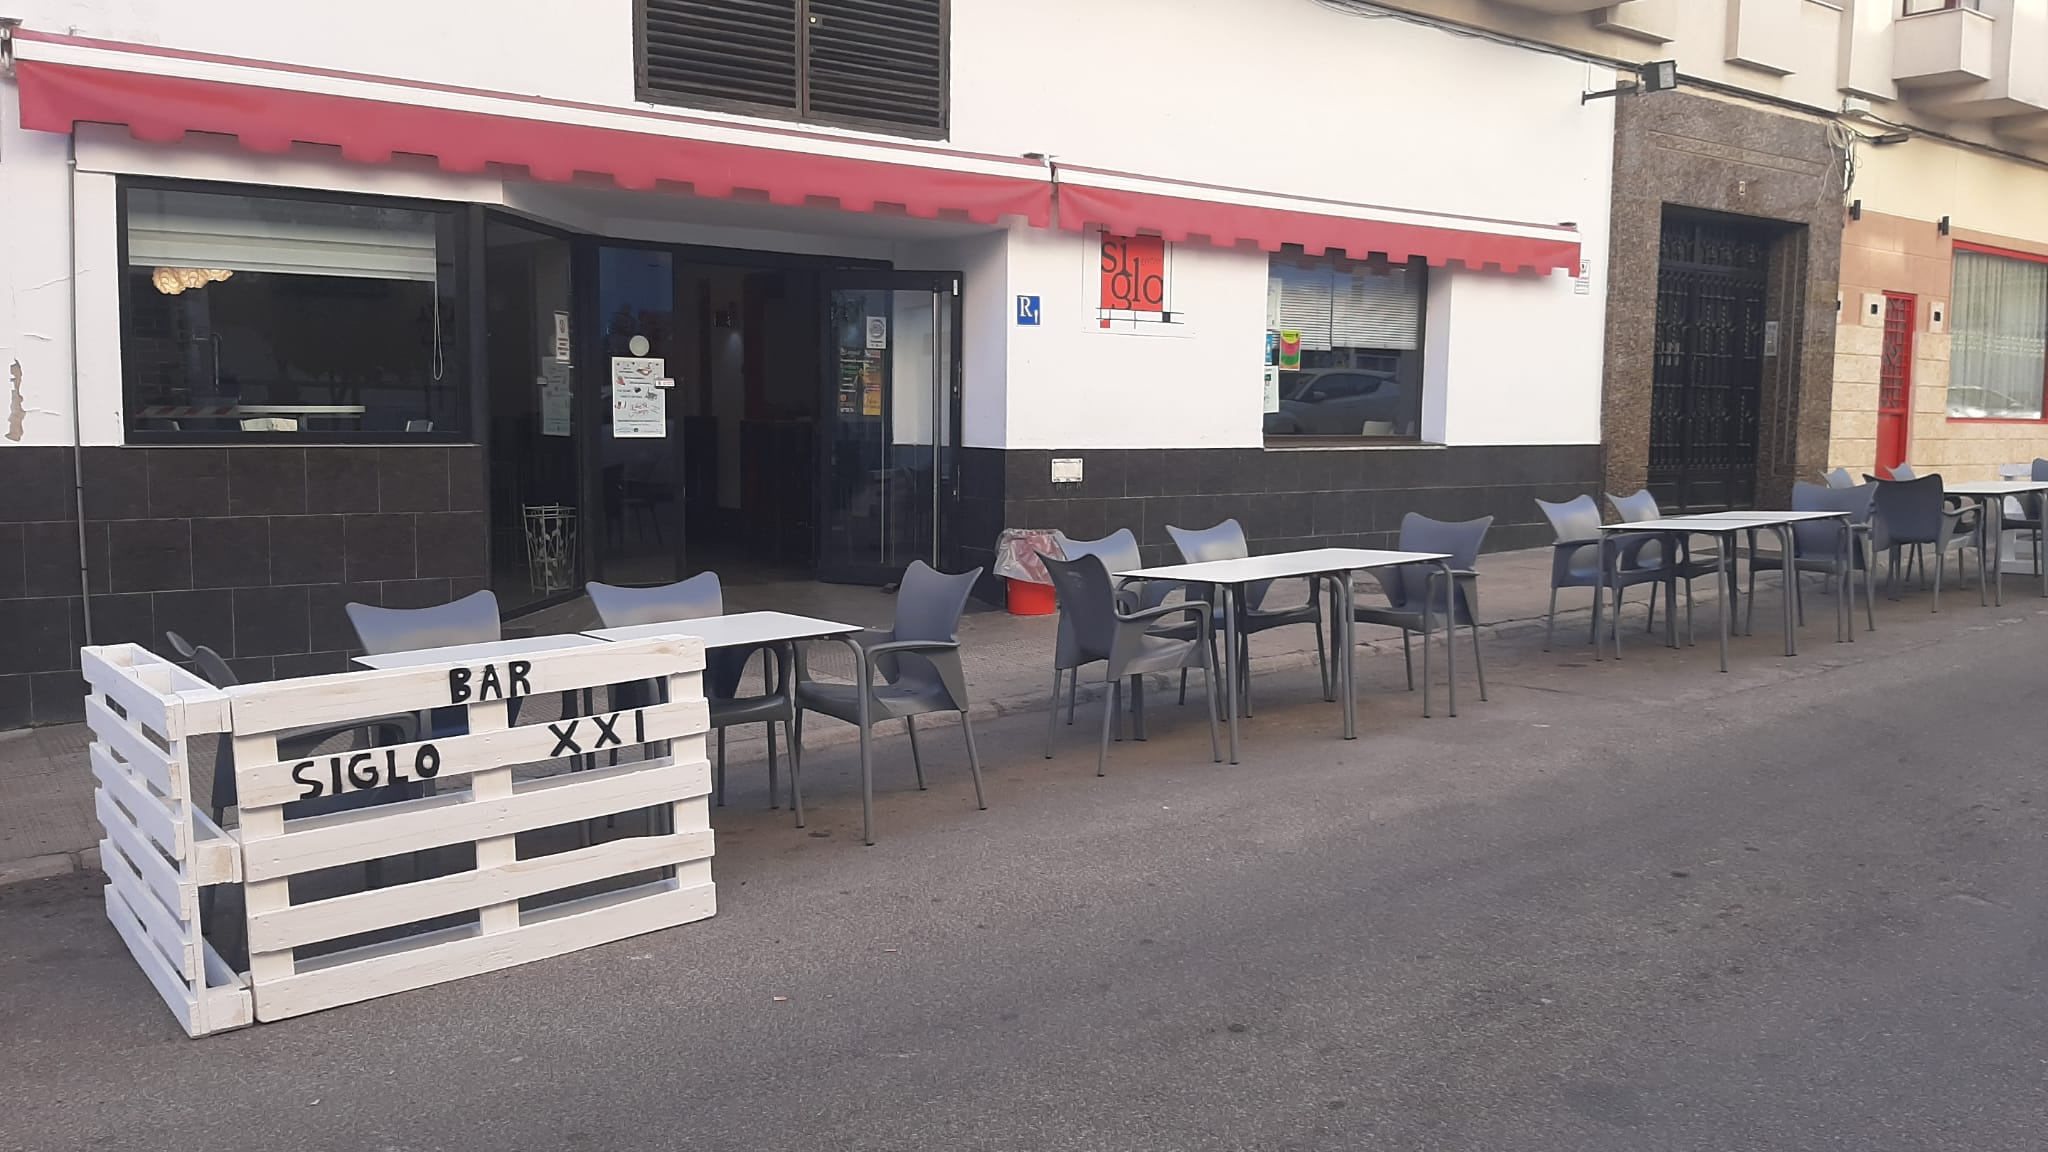 Donde comer en Navalmoral de la Mata Restaurante Cafetería Nuevo Siglo XXIDonde comer en Navalmoral de la Mata Restaurante Cafetería Nuevo Siglo XXI